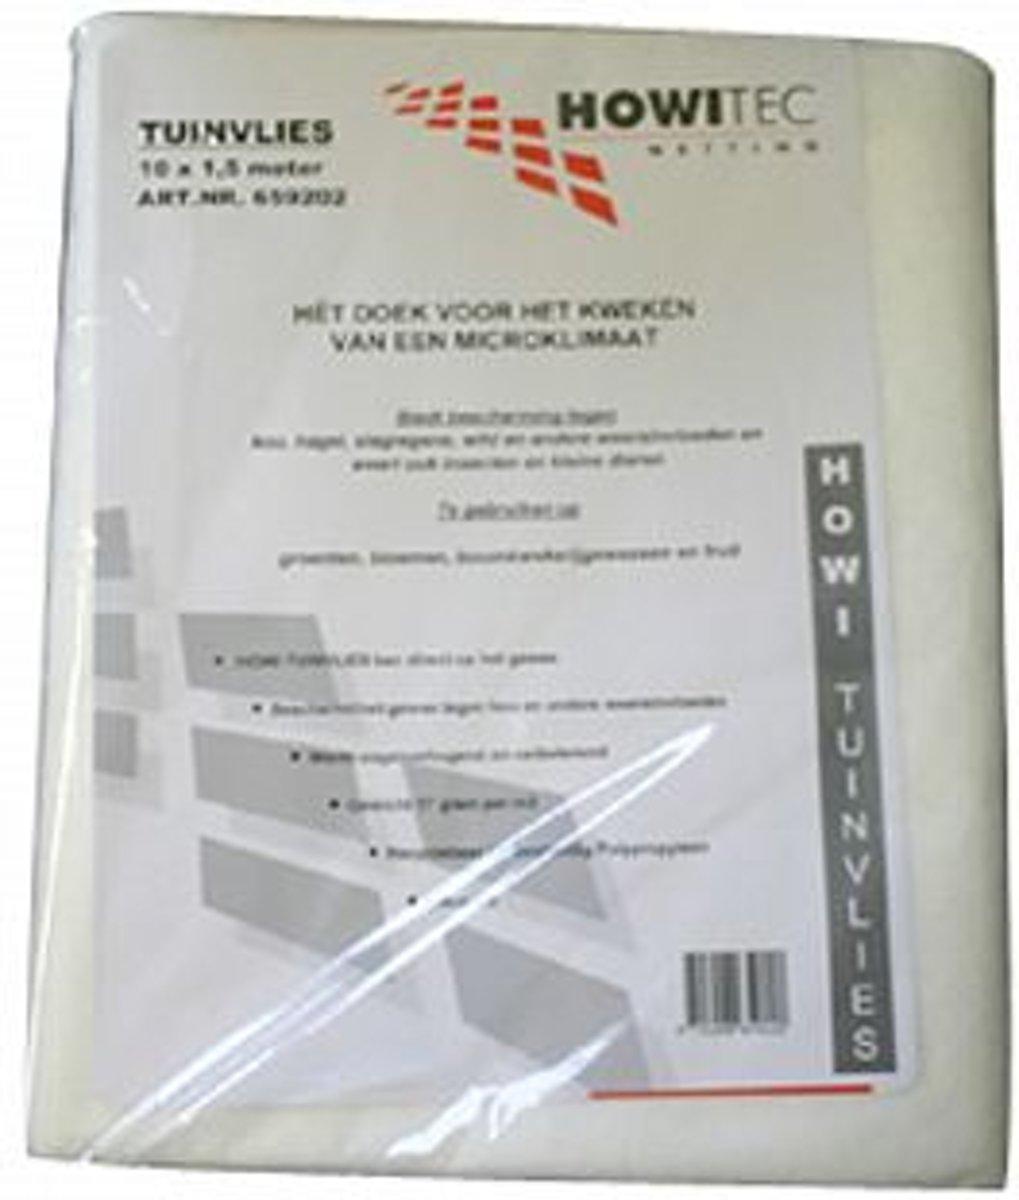 Tuinvlies - Transparant - 10 x 1,5 m kopen